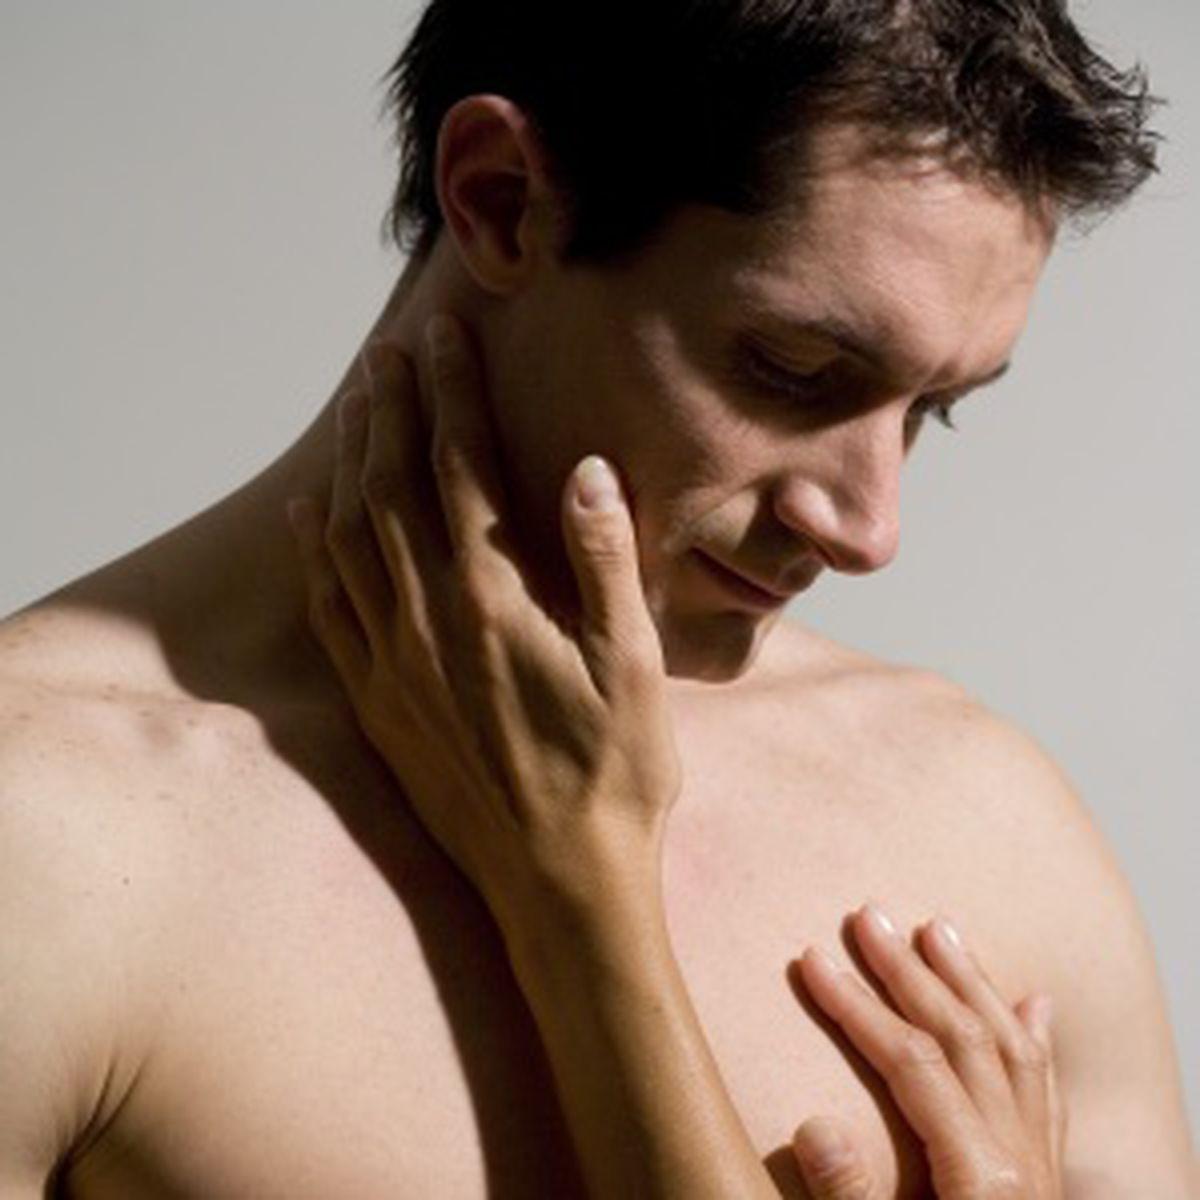 Disfunctia erectila - cauze, simptome si remedii